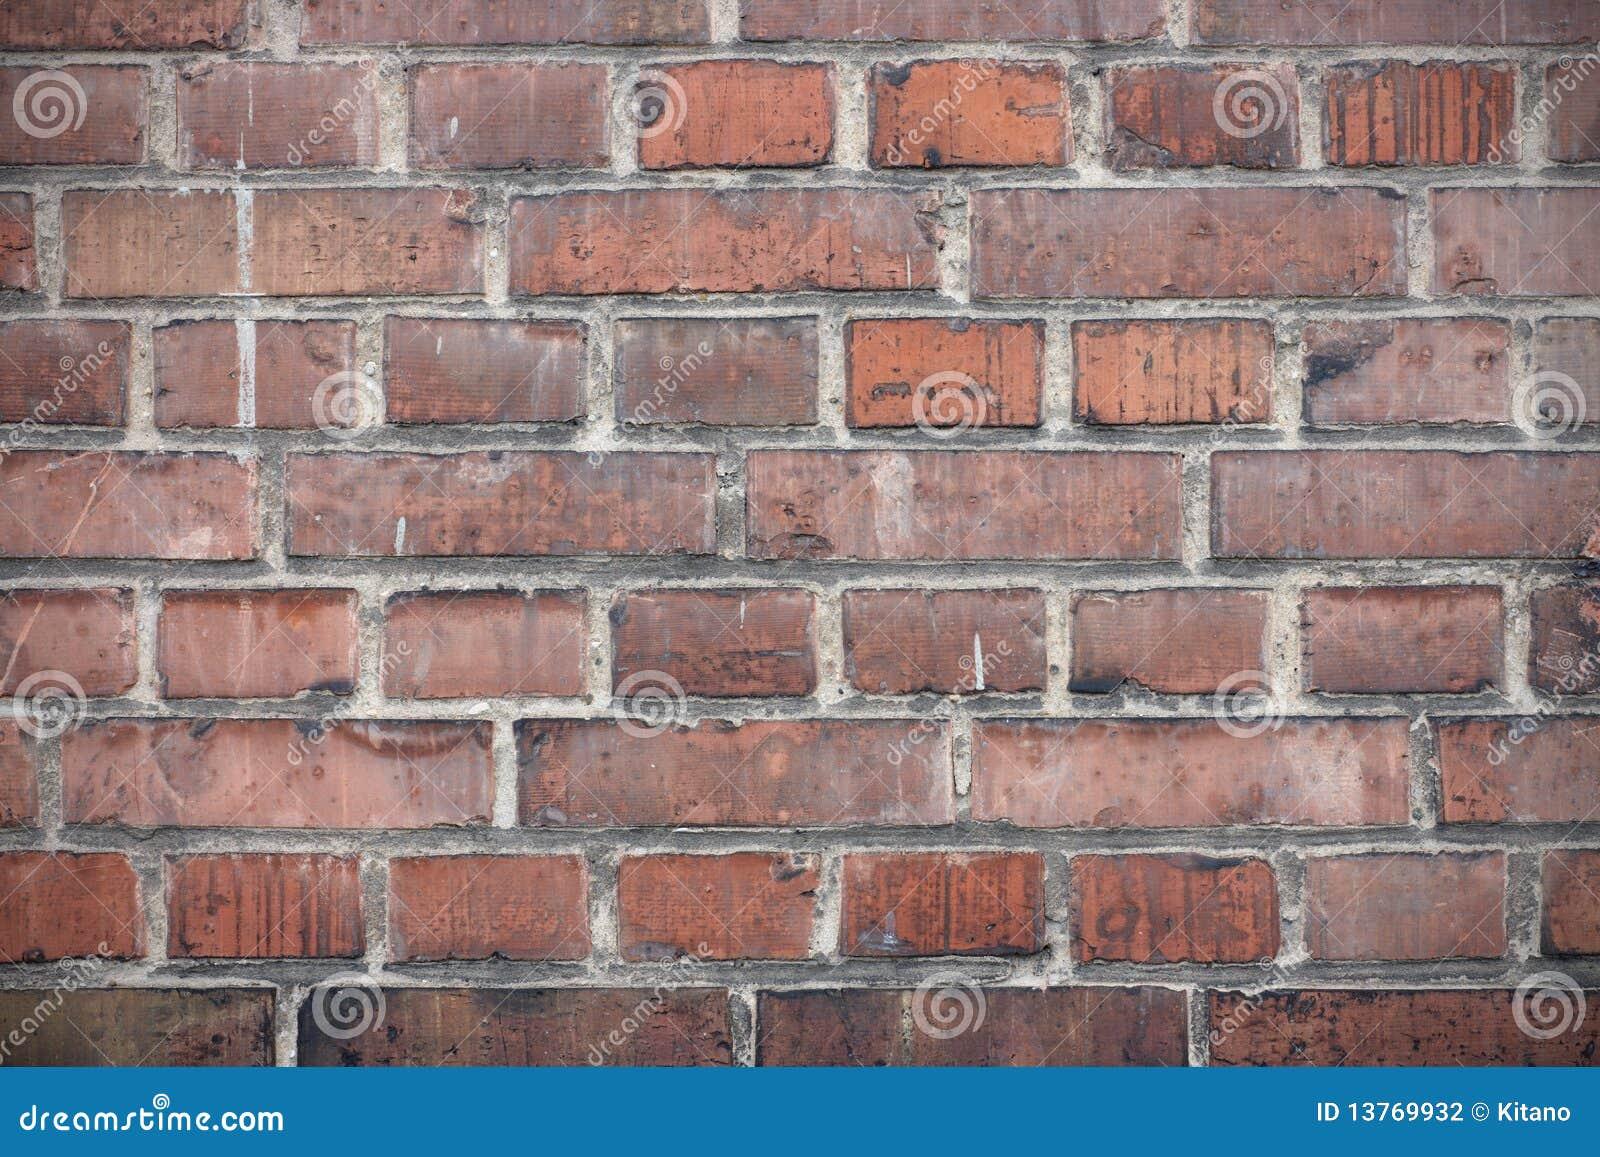 Old Brick Wall Stock Photography Image 13769932